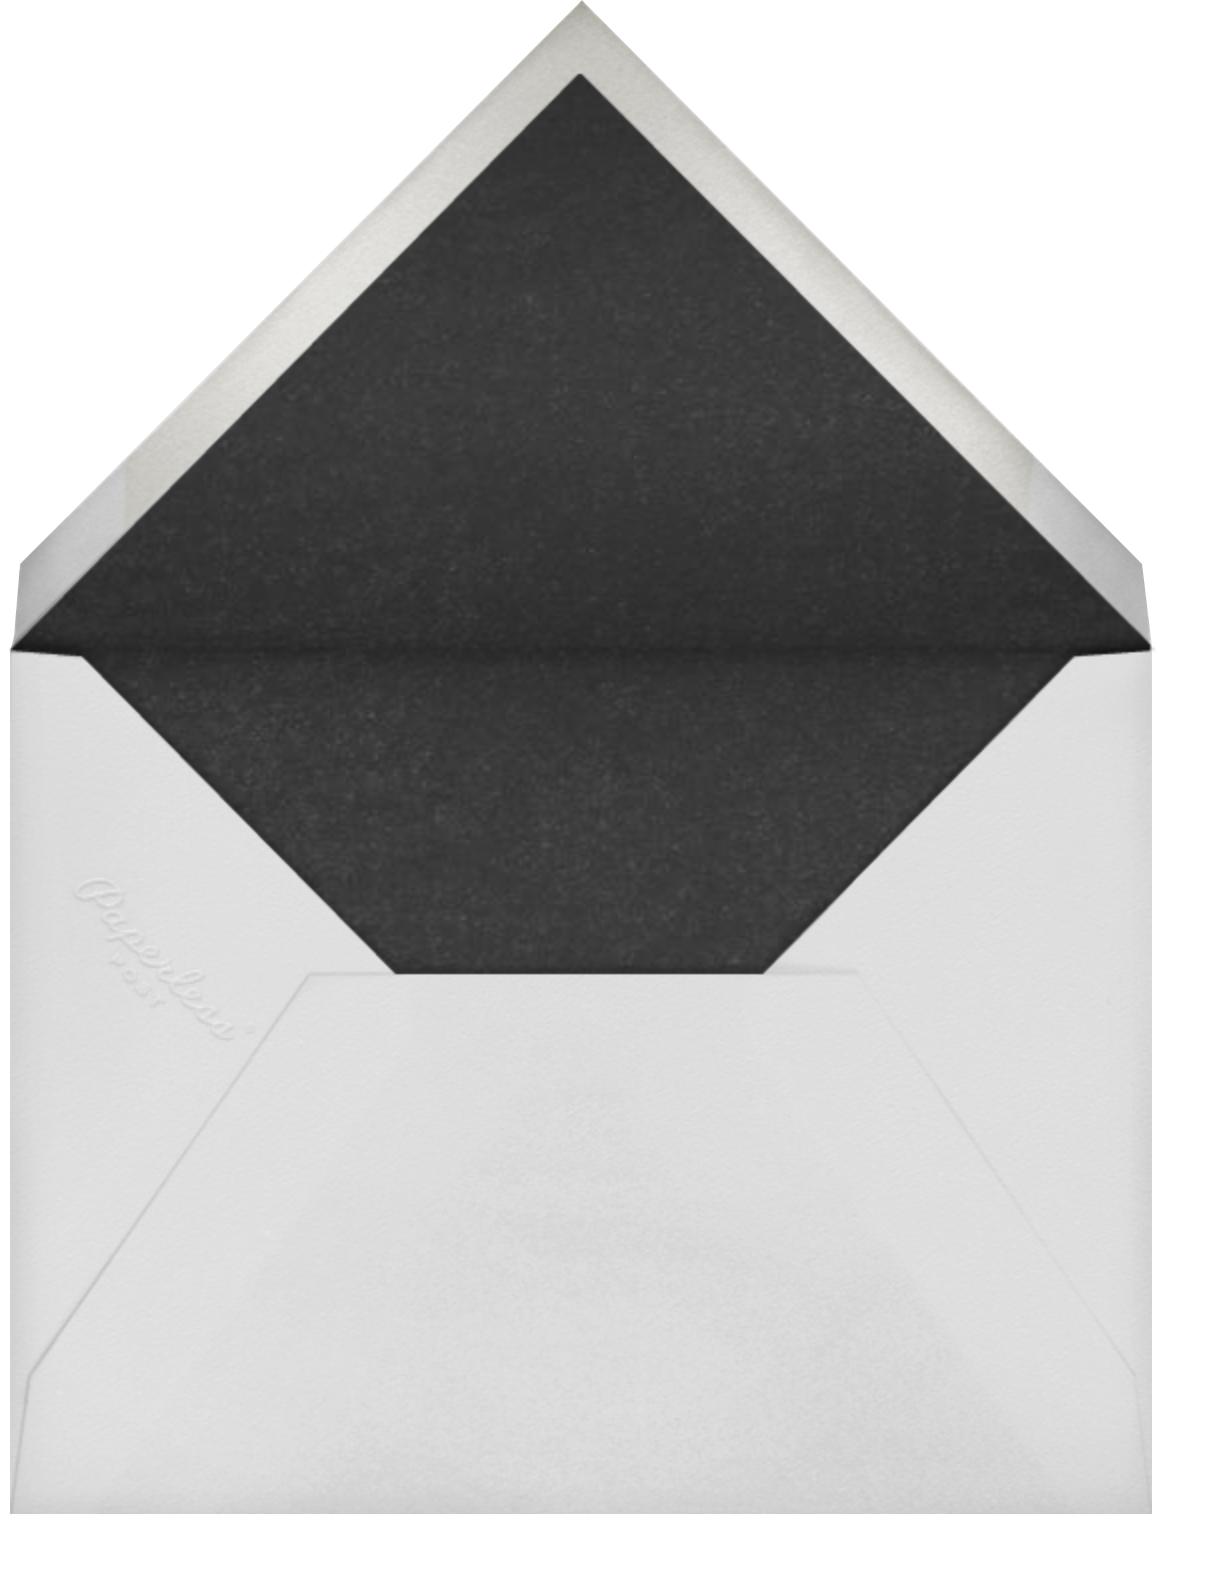 Gradient Painted - Black - Paperless Post - Bridal shower - envelope back